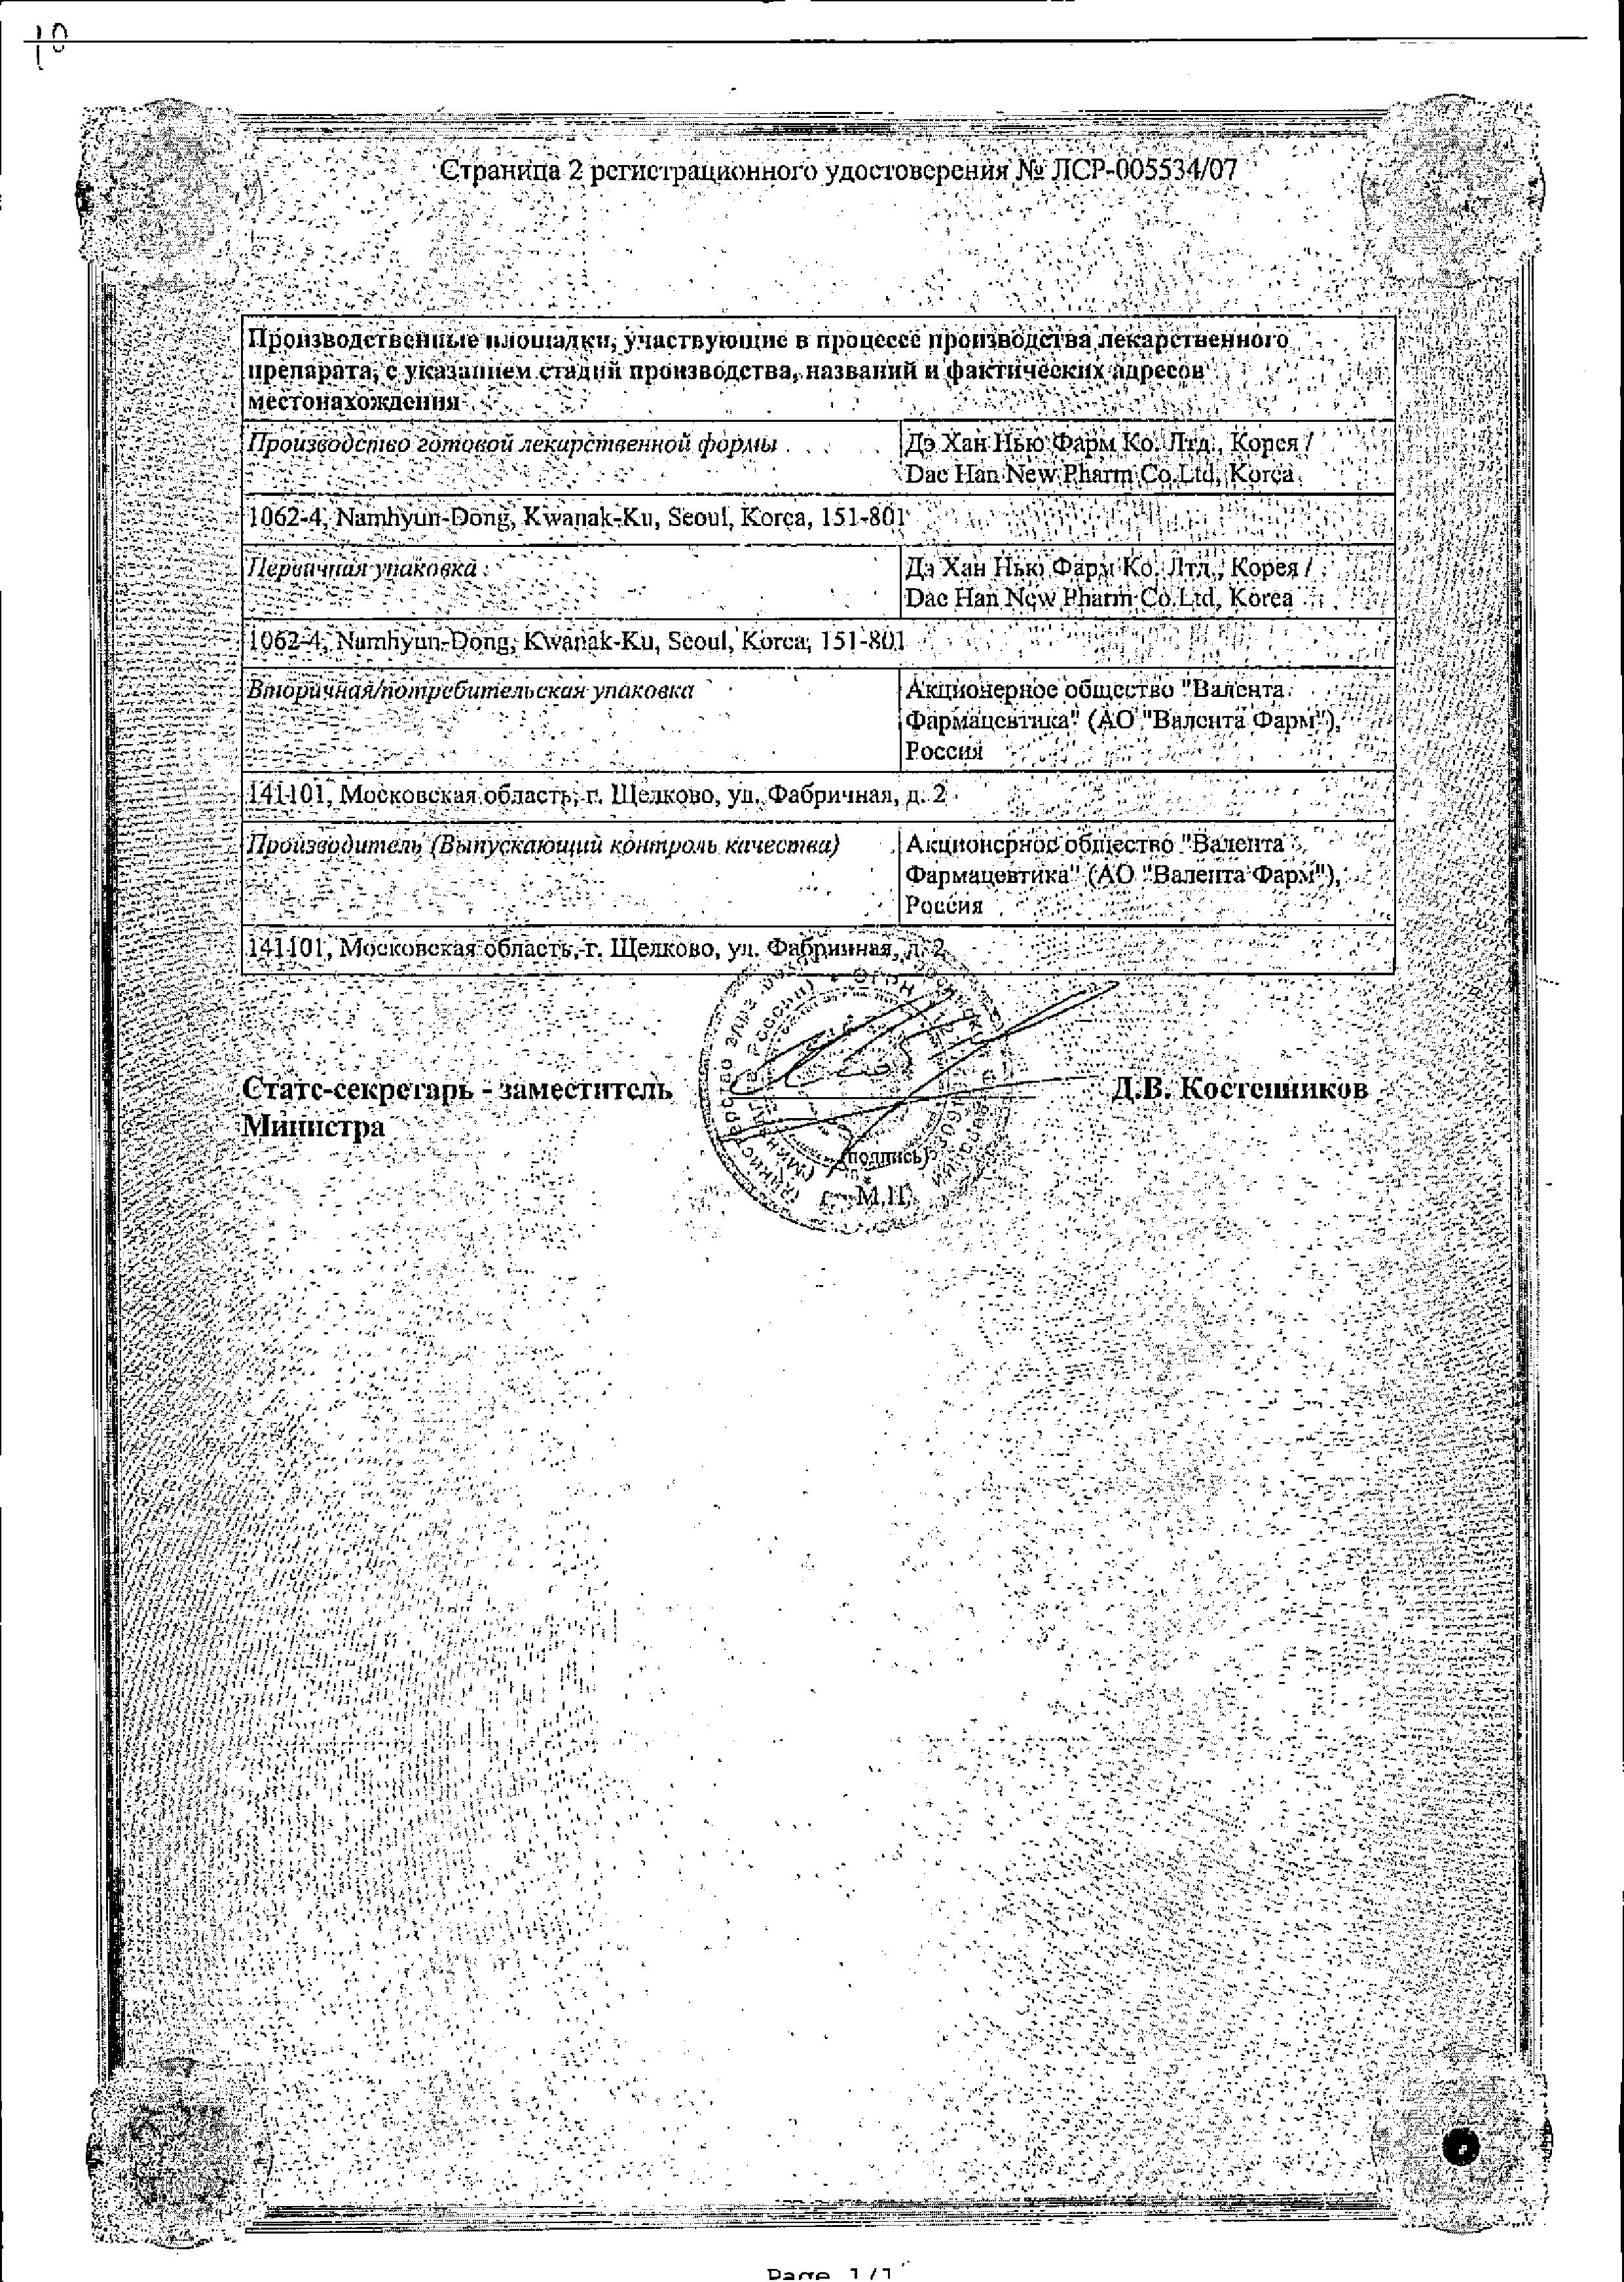 Тримедат сертификат